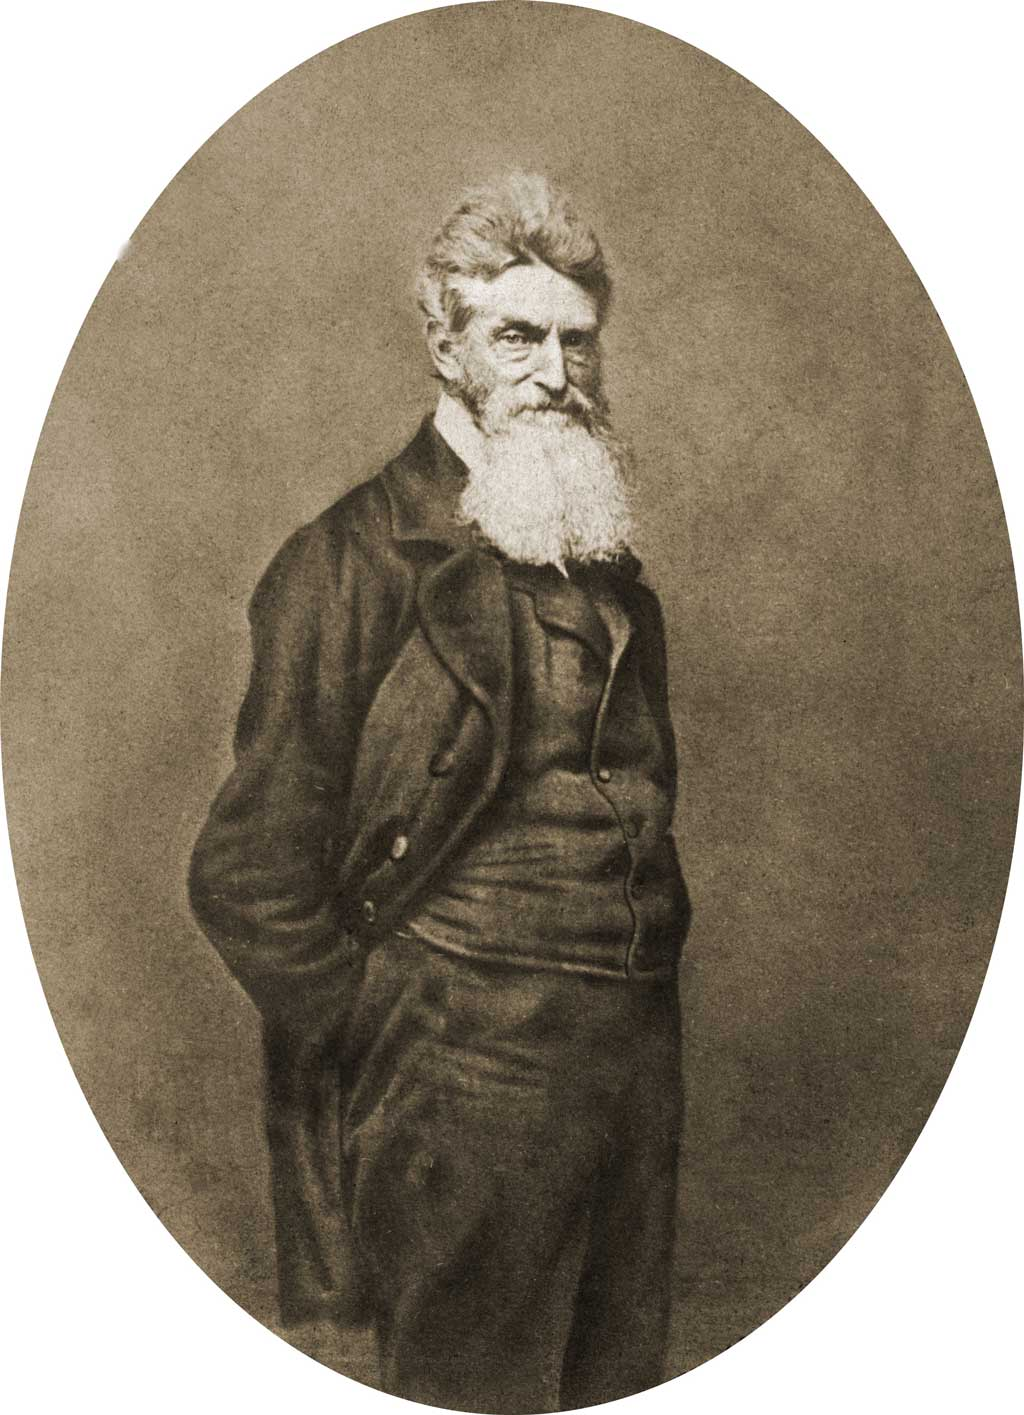 Portrait of John Brown